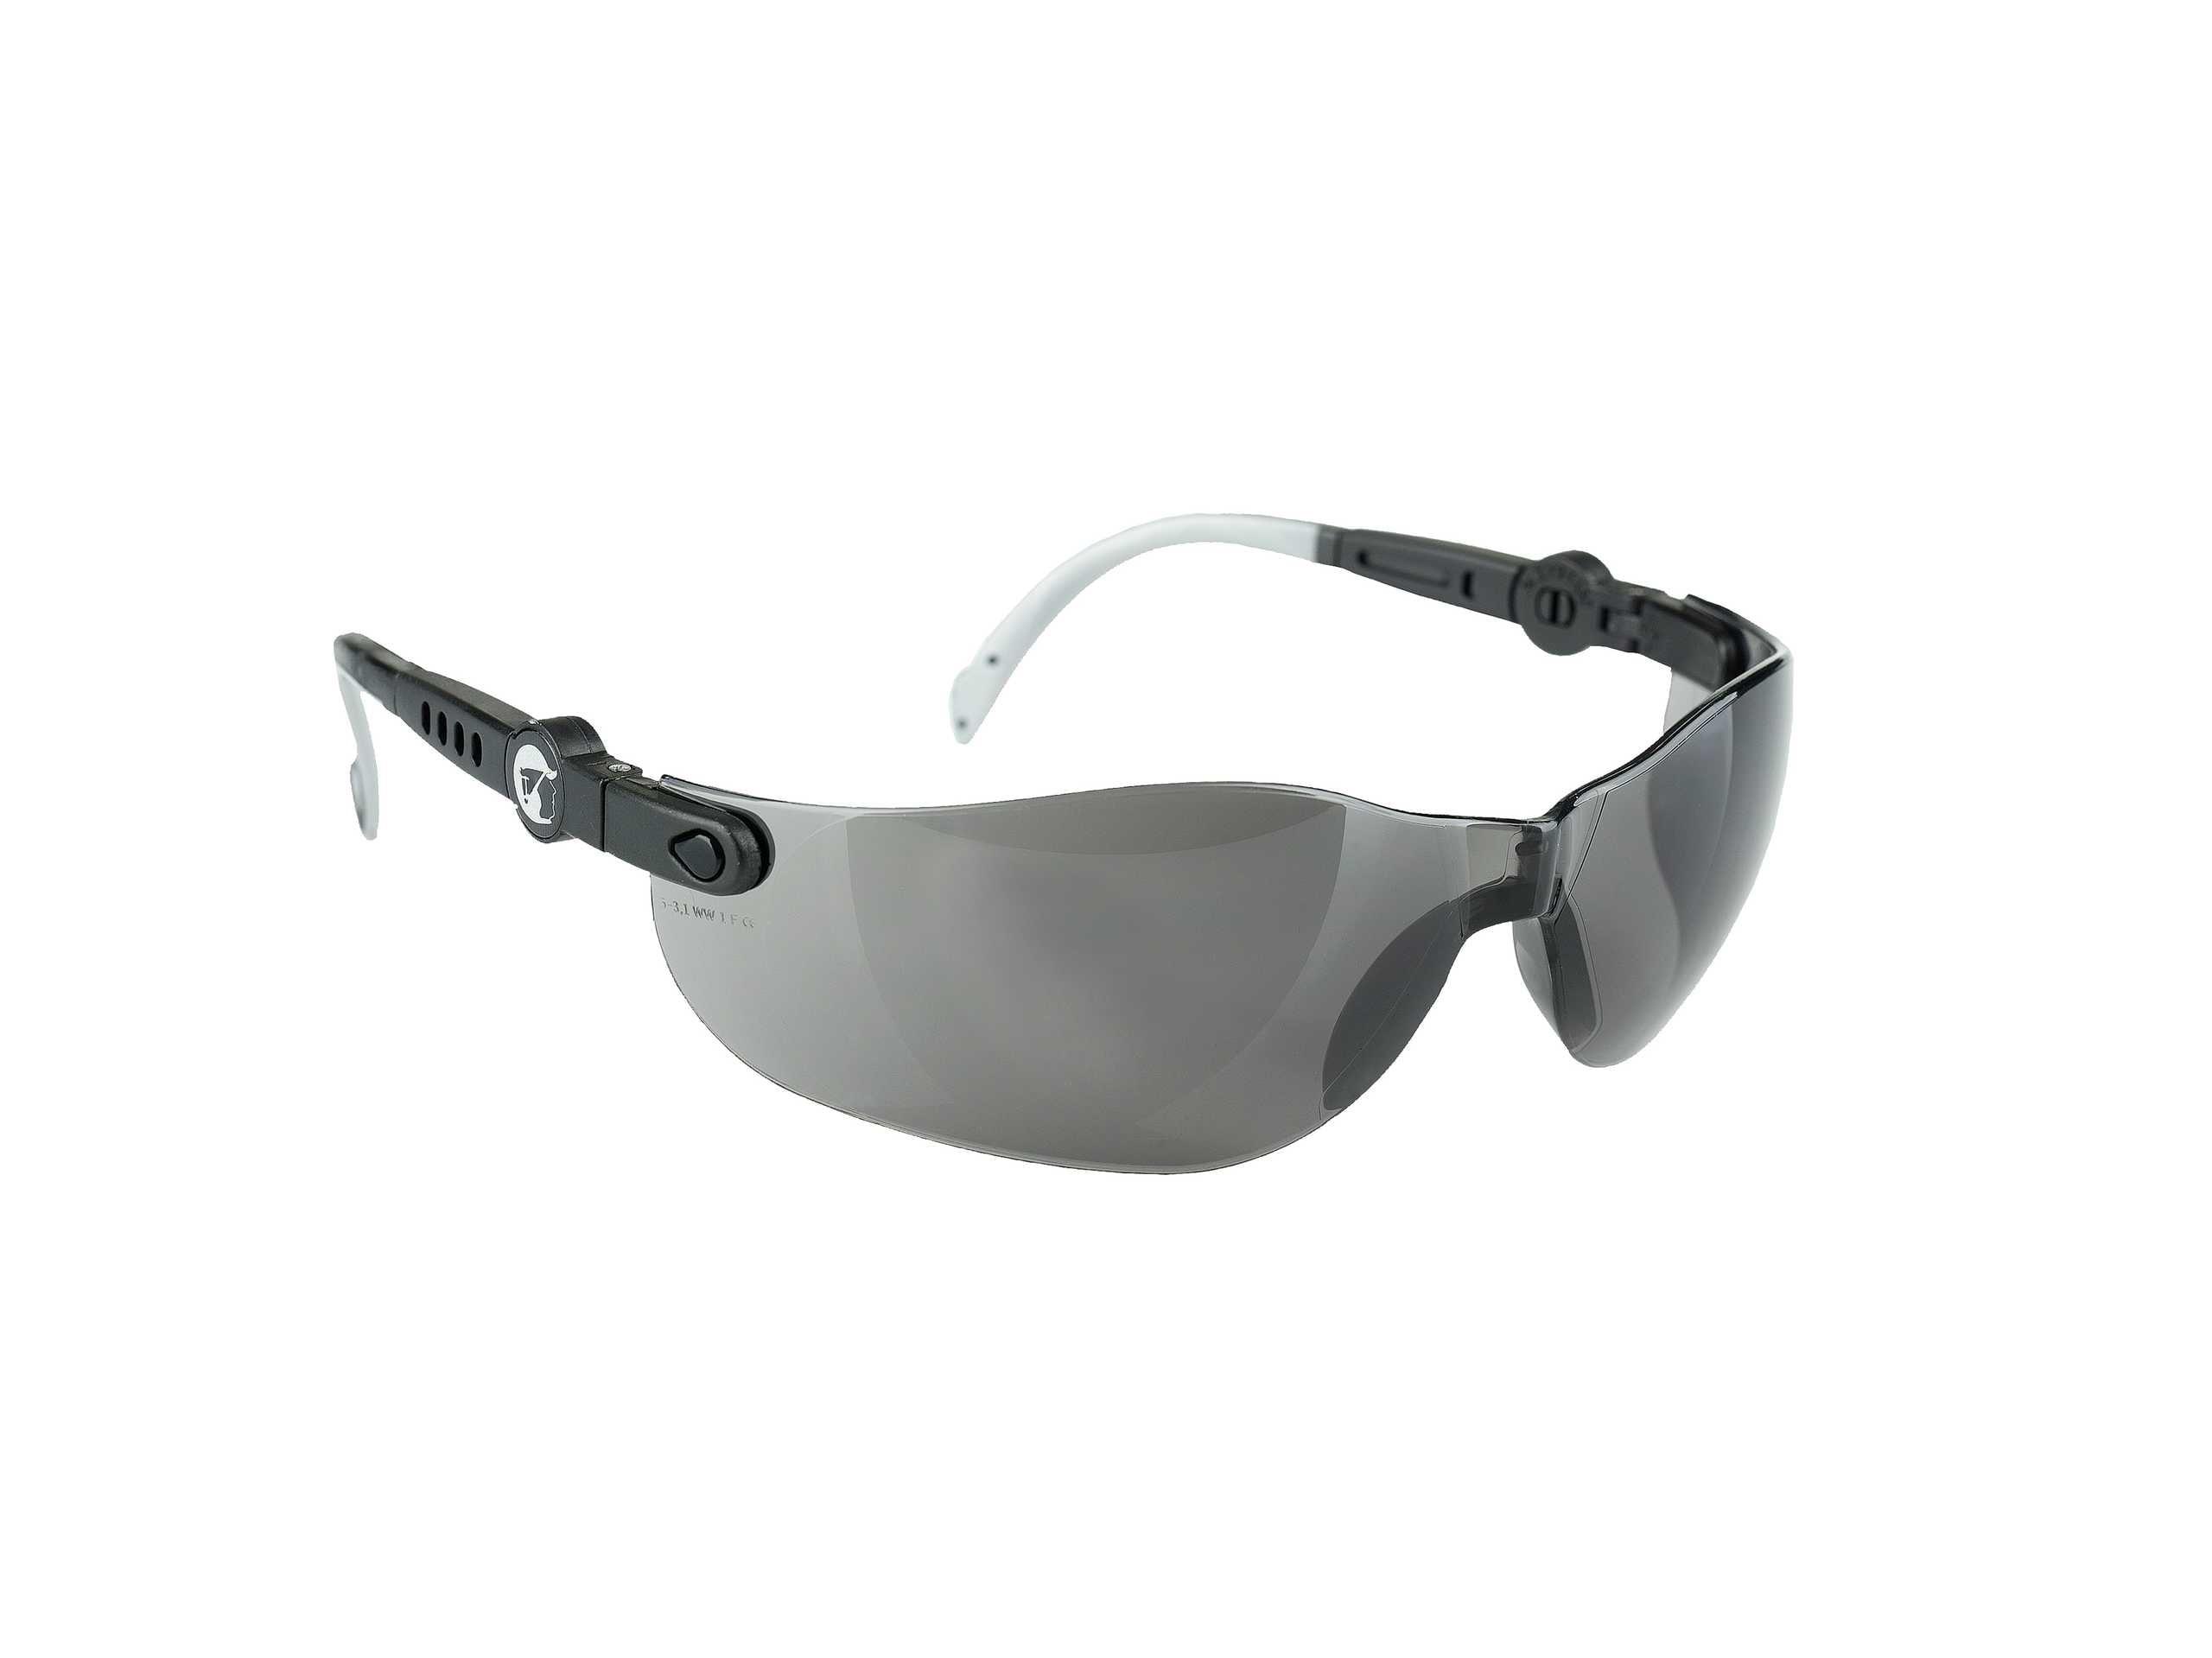 Pro justerbare kjørebriller